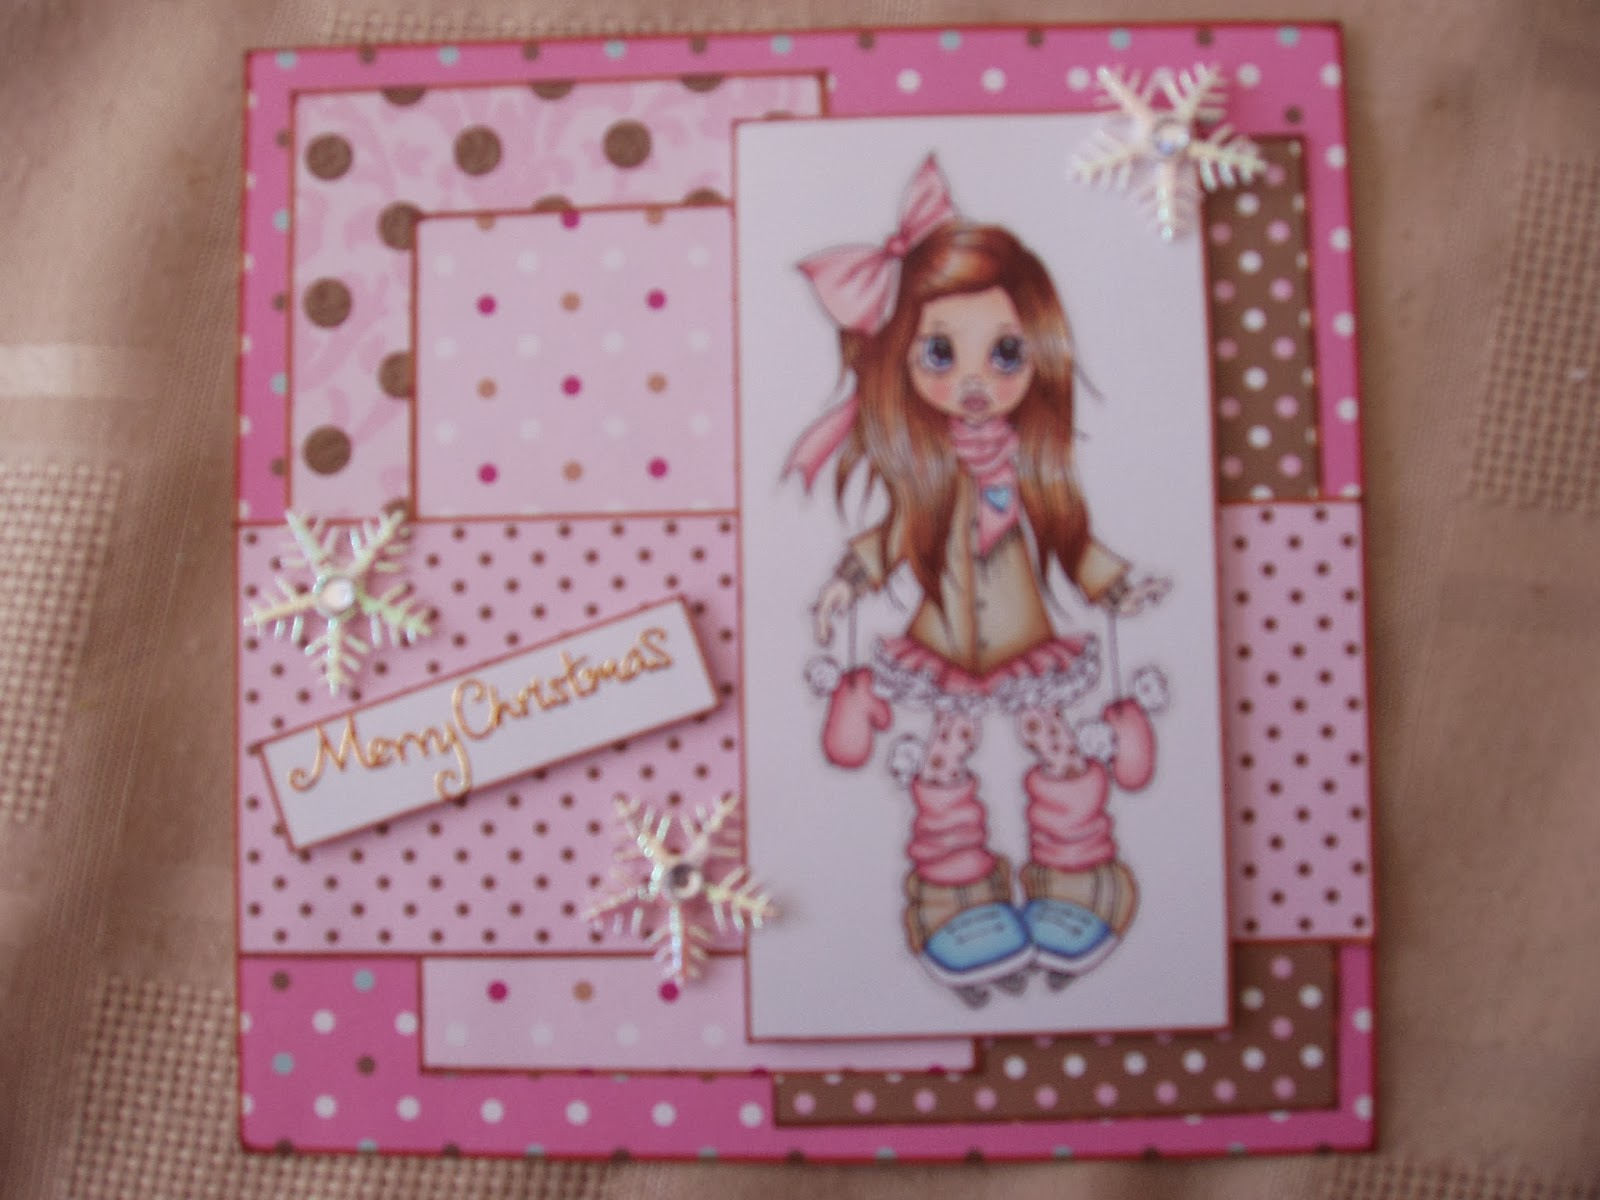 http://flossbites-cardmaking.blogspot.com/2013/04/polka-dot-pinky-nikki-christmas-card.html